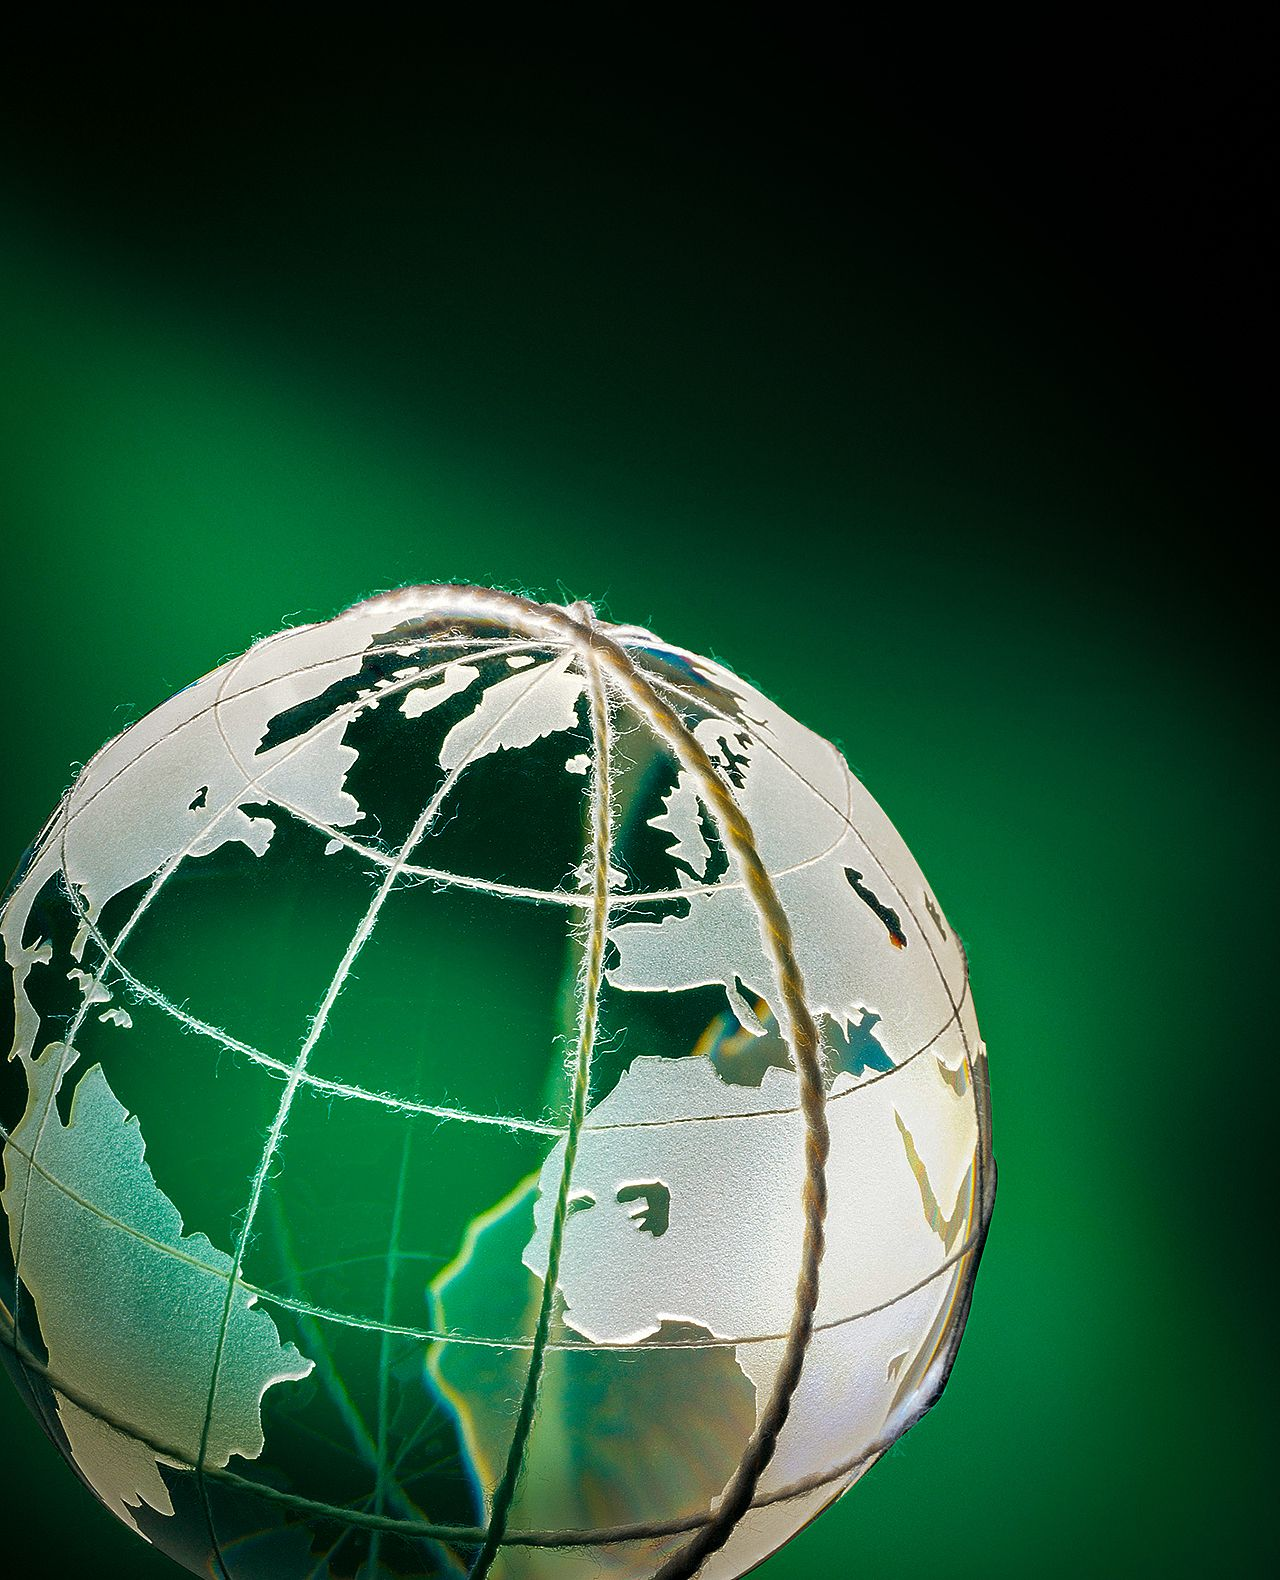 cover-globe2ContAdj2.jpg